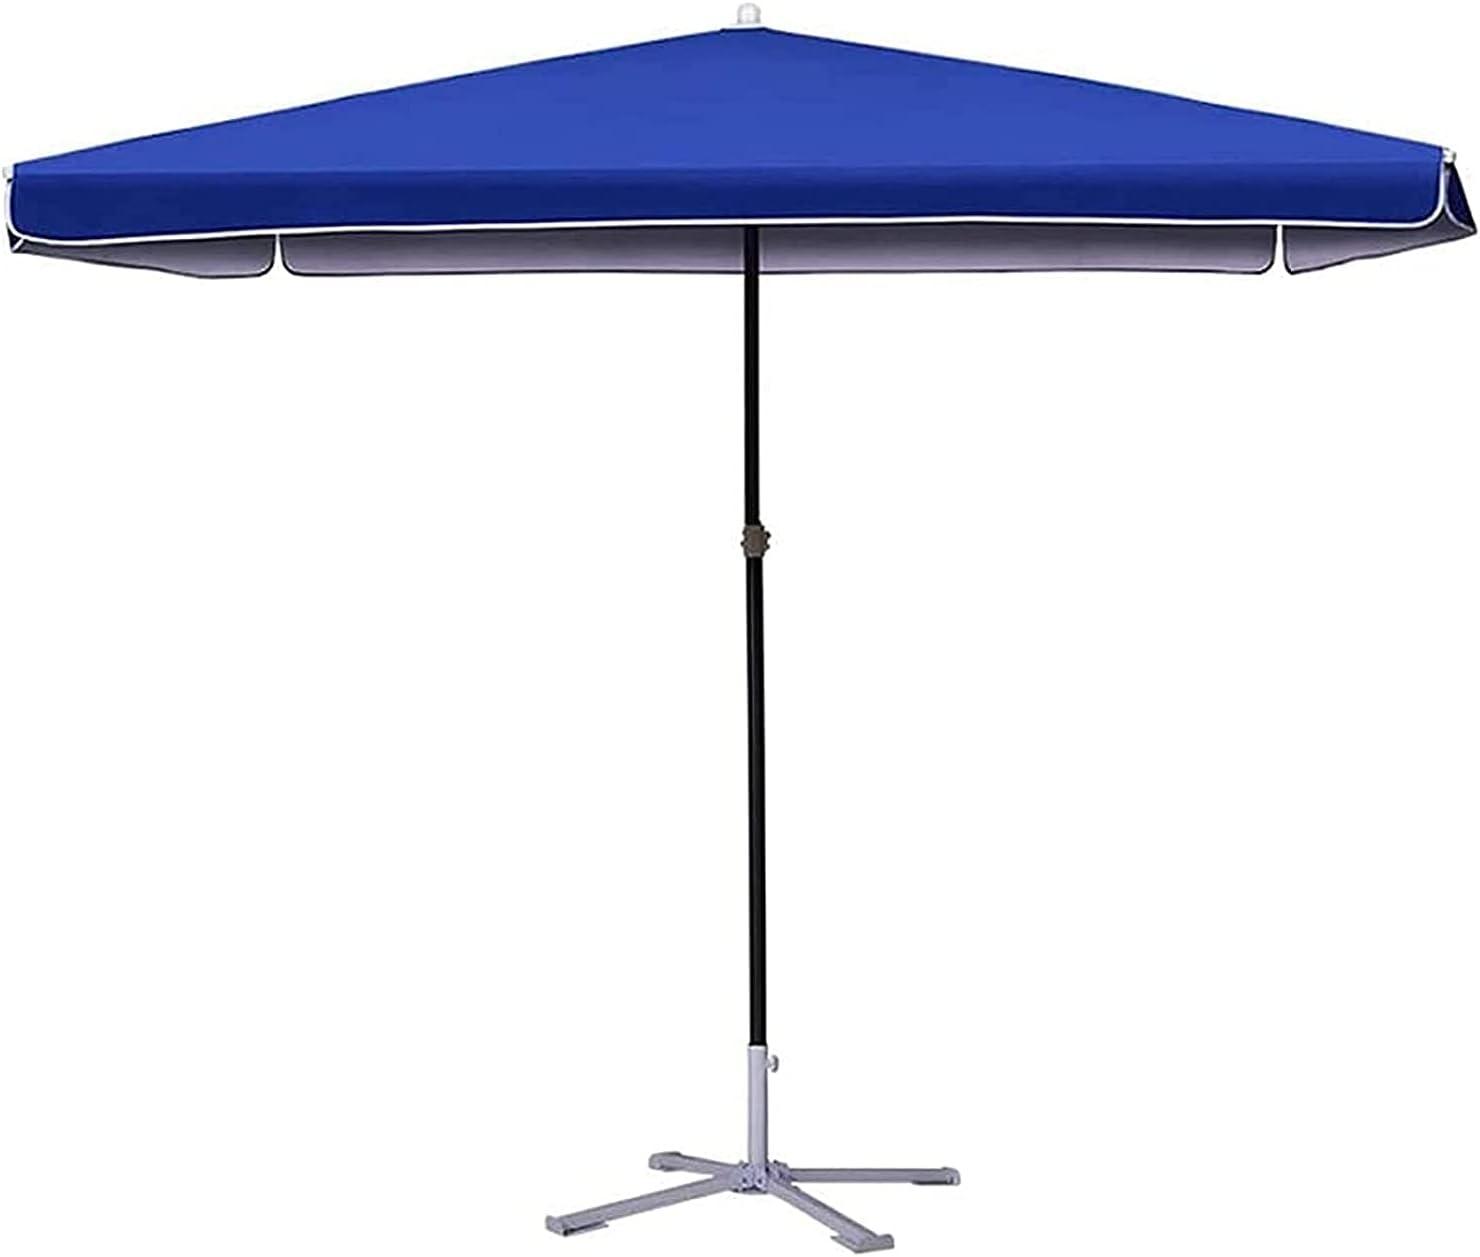 FENGNV Large Parasol Brand Ranking TOP11 new Umbrella Blue Mar Outdoor Patio Rectangular